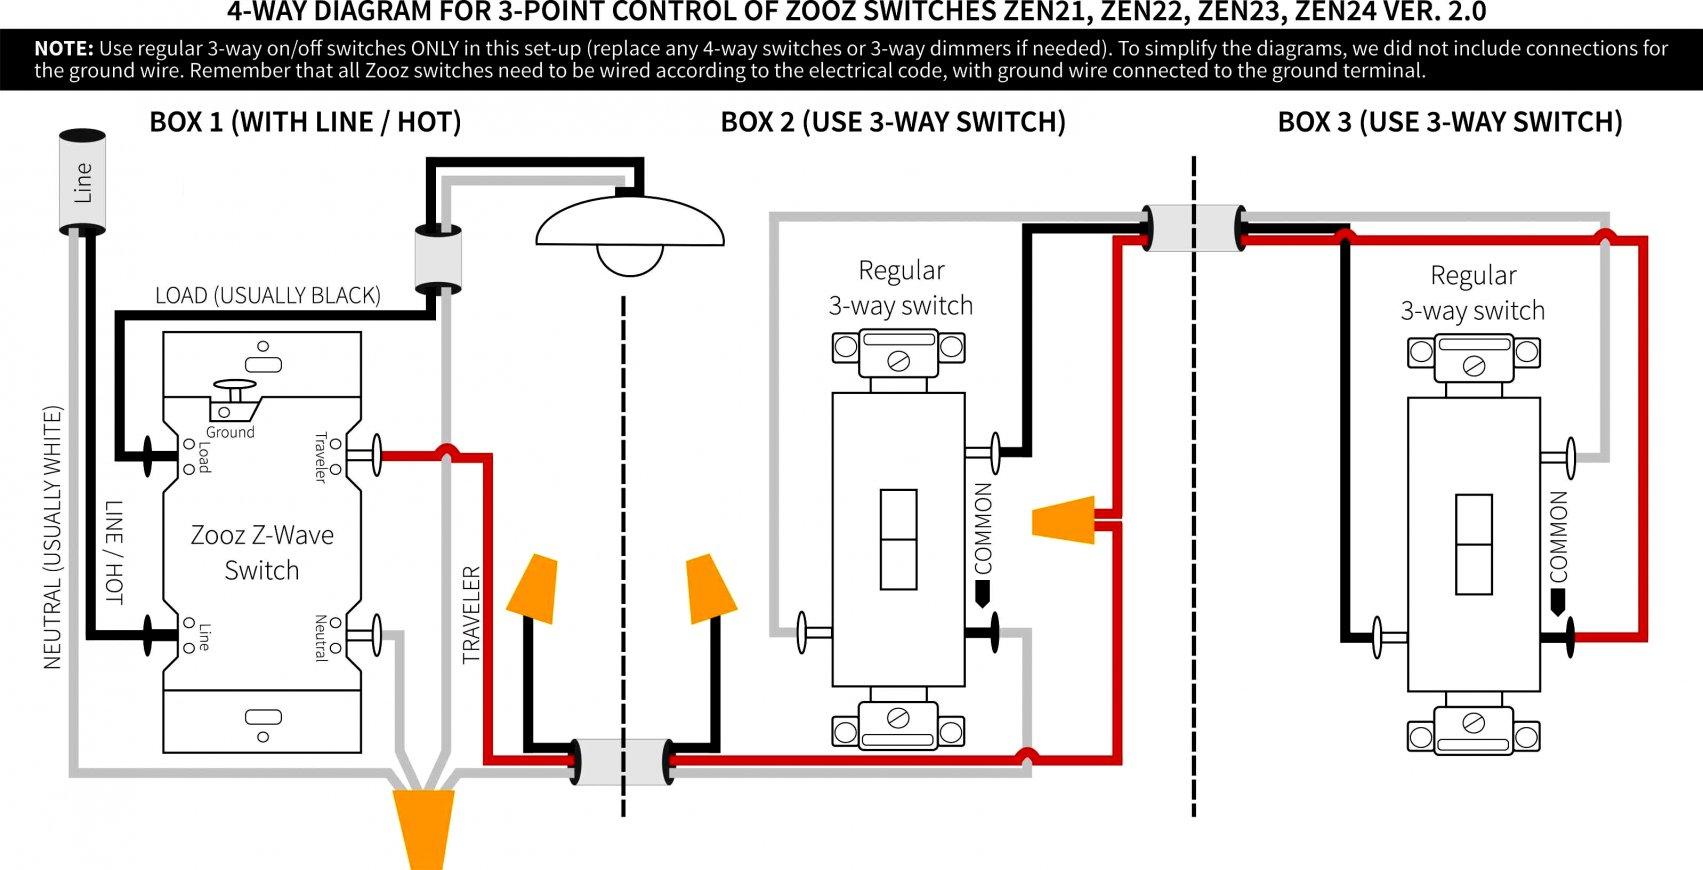 Leviton 3 Way Dimmer Switch Wiring Diagram - Data Wiring Diagram Site - Leviton Dimmers Wiring Diagram